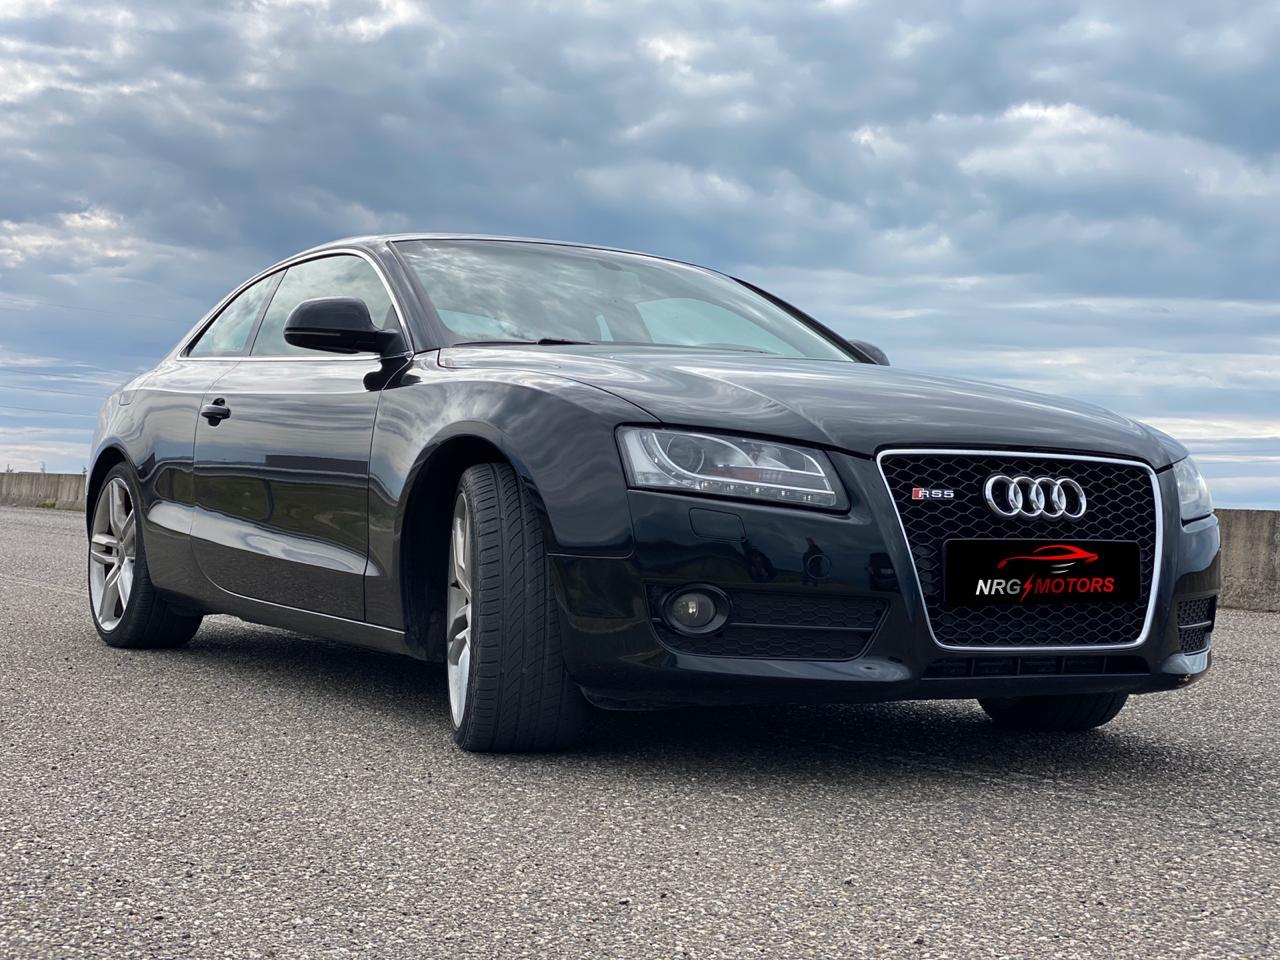 Audi A5 ne shitje durres, shitet audi A5, audi a 5 s line ne shitje